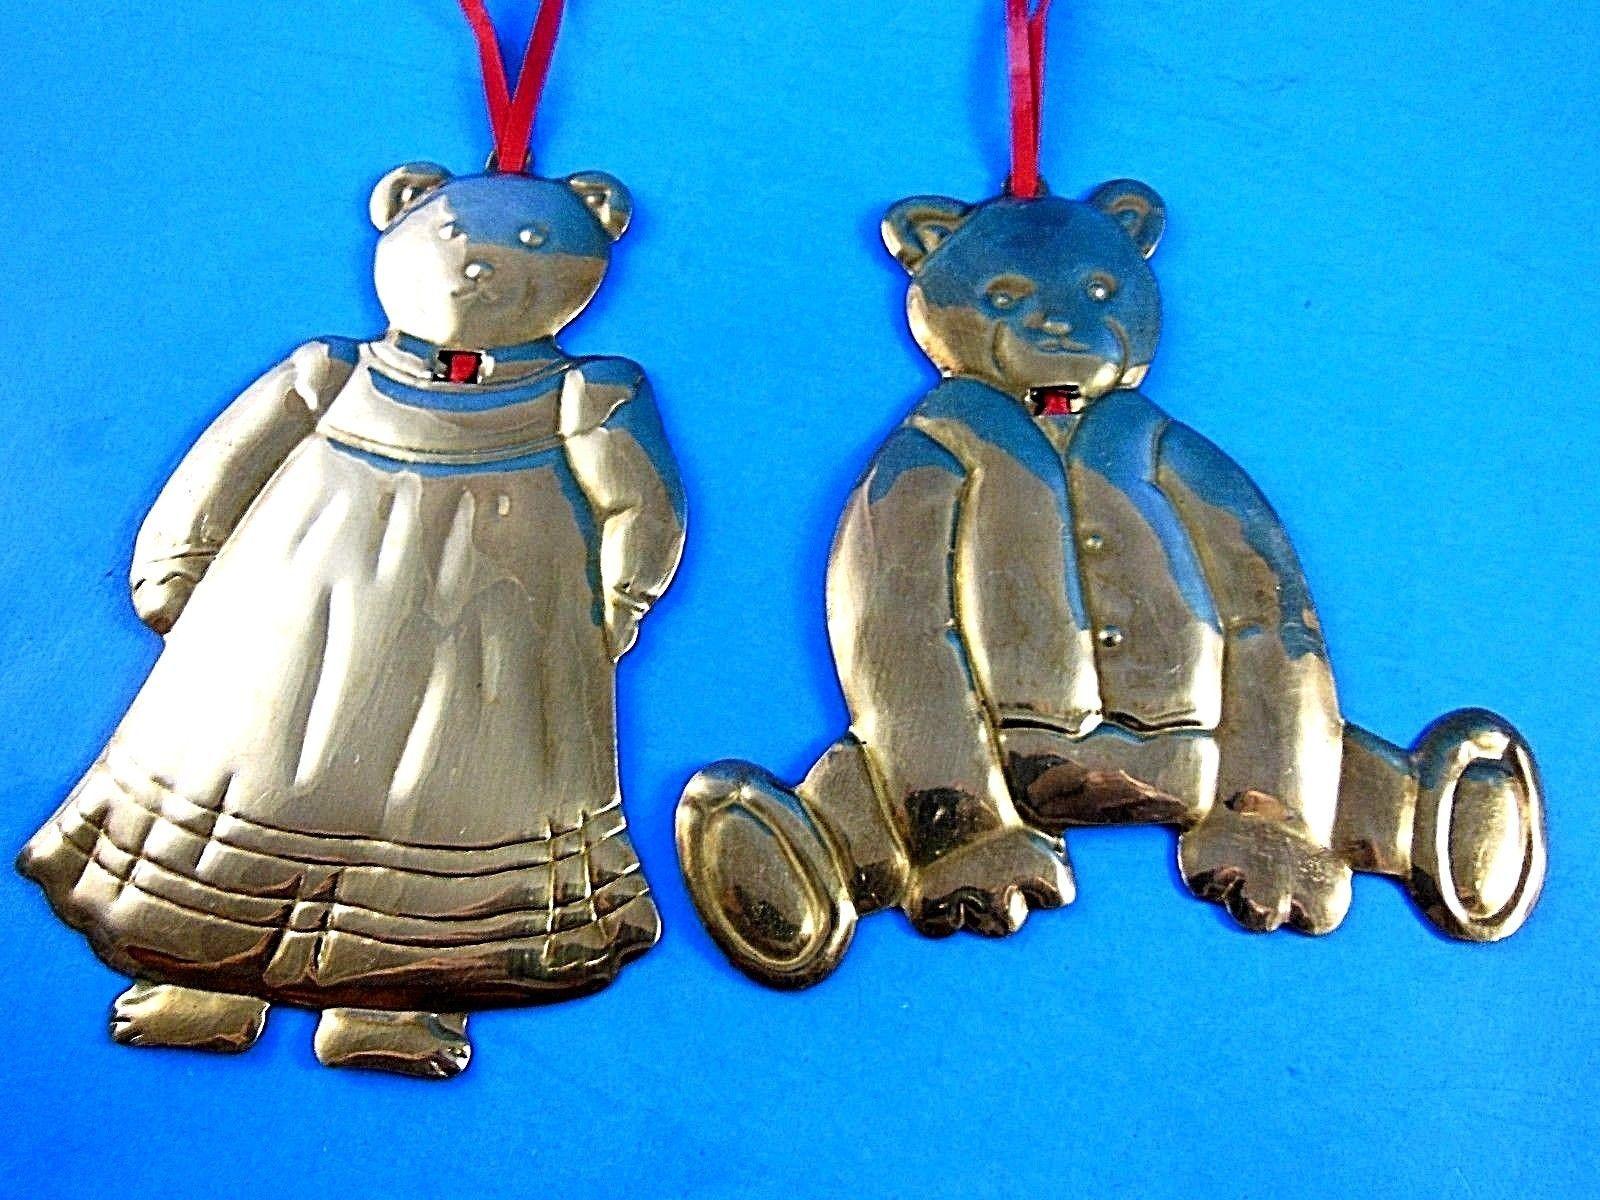 DEPT 56 Brass Bear Christmas Ornaments Set of 2 - $8.31